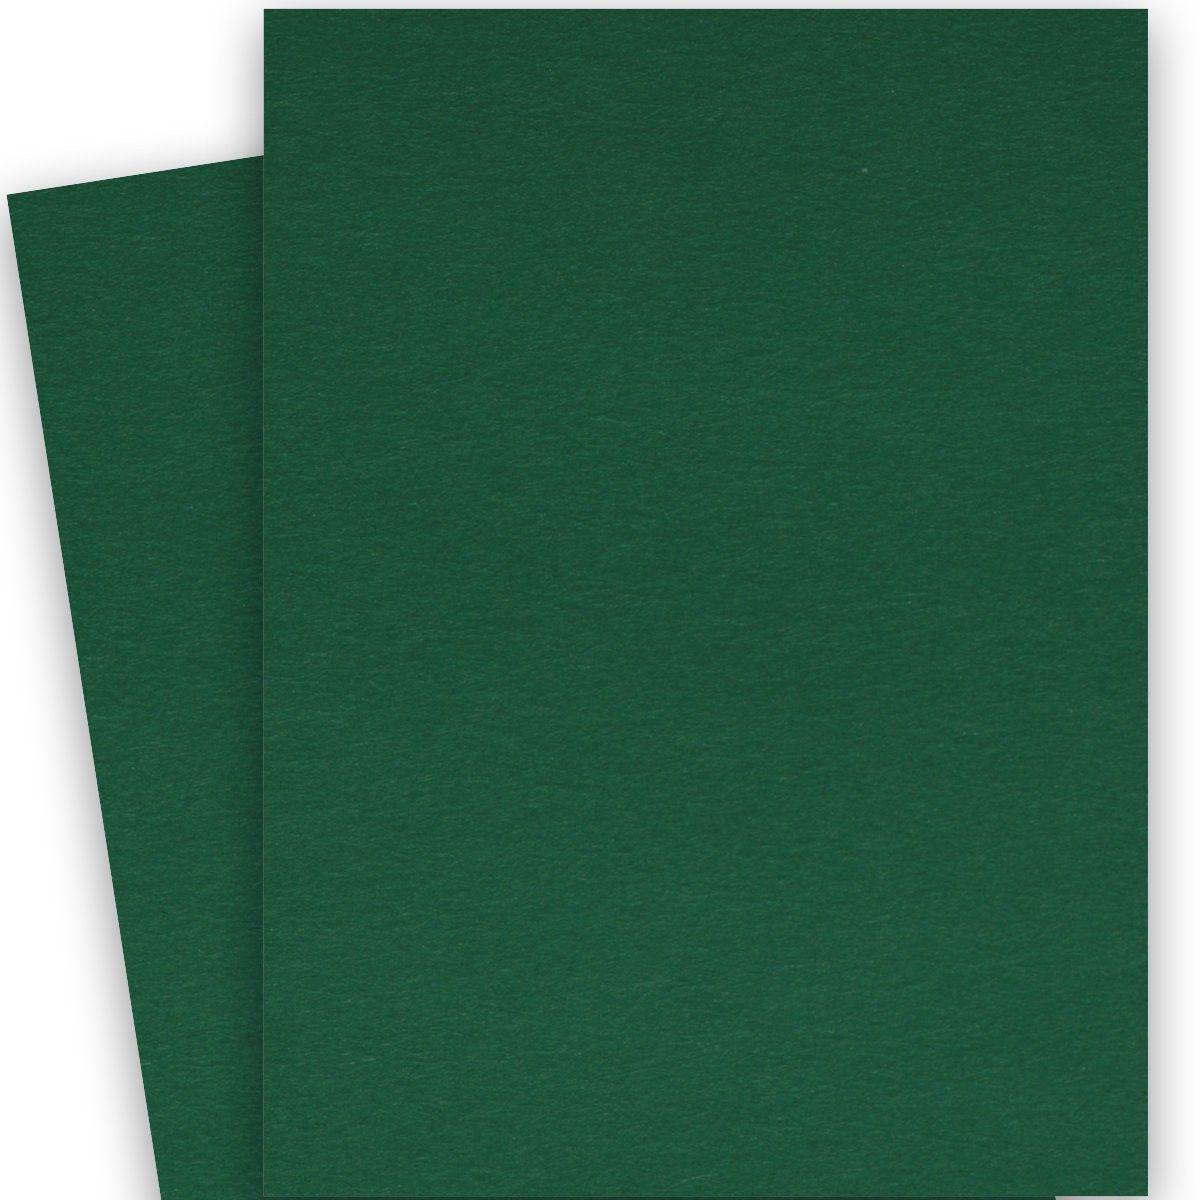 Basis Colors 26 X 40 Cardstock Paper Green 80lb Cover 100 Pk In 2021 Card Stock Cardstock Paper Vat Dyeing